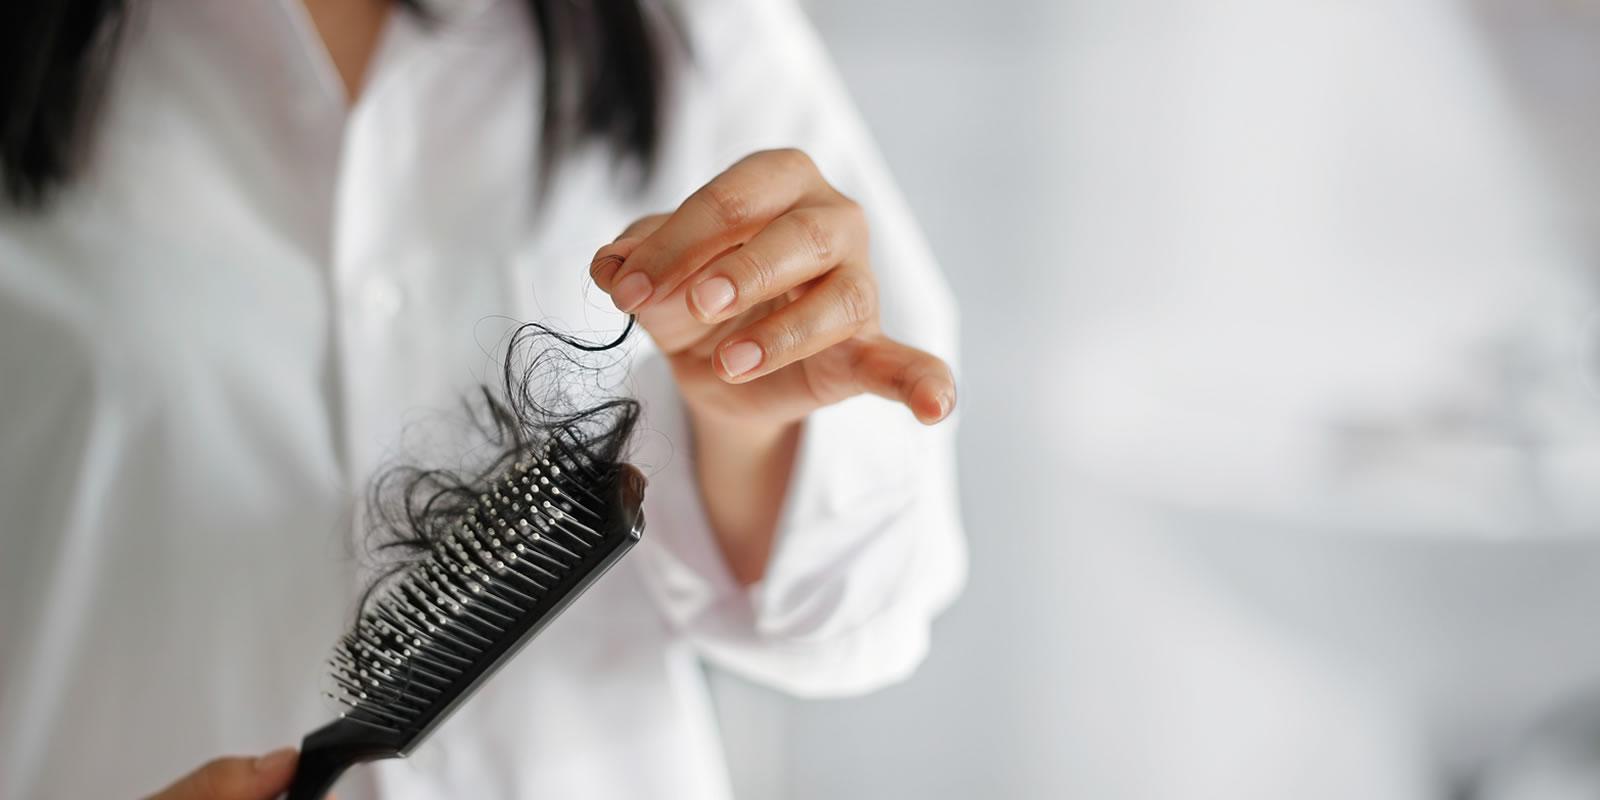 Haarausfall Ursachen und Behandlung